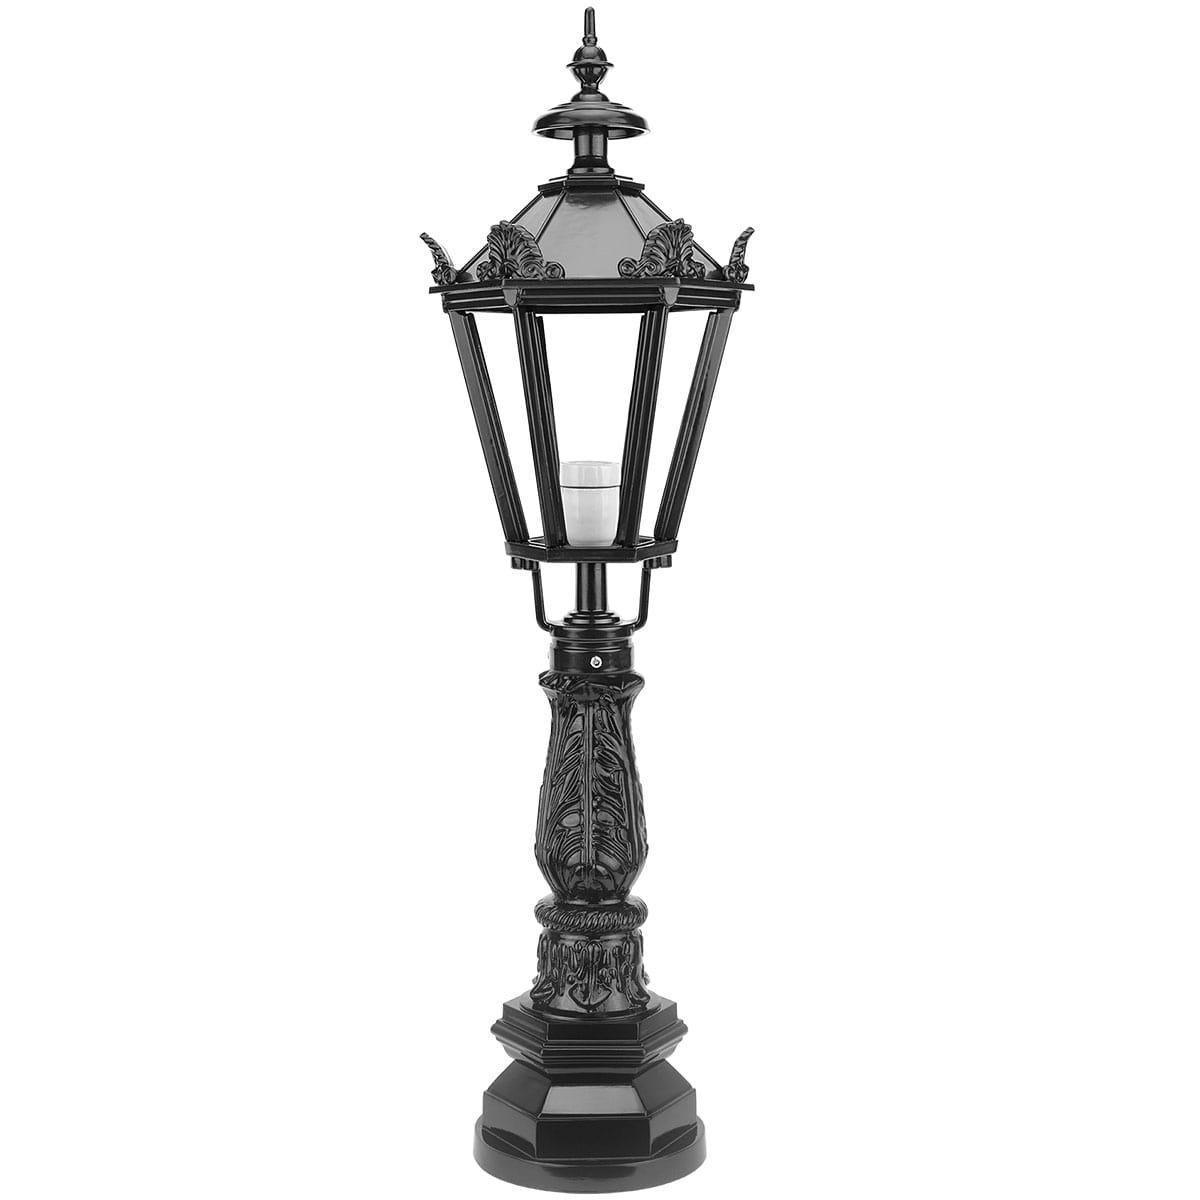 Outdoor Lighting Classic Rural Garden lamp Kelmond with crowns - 112 cm